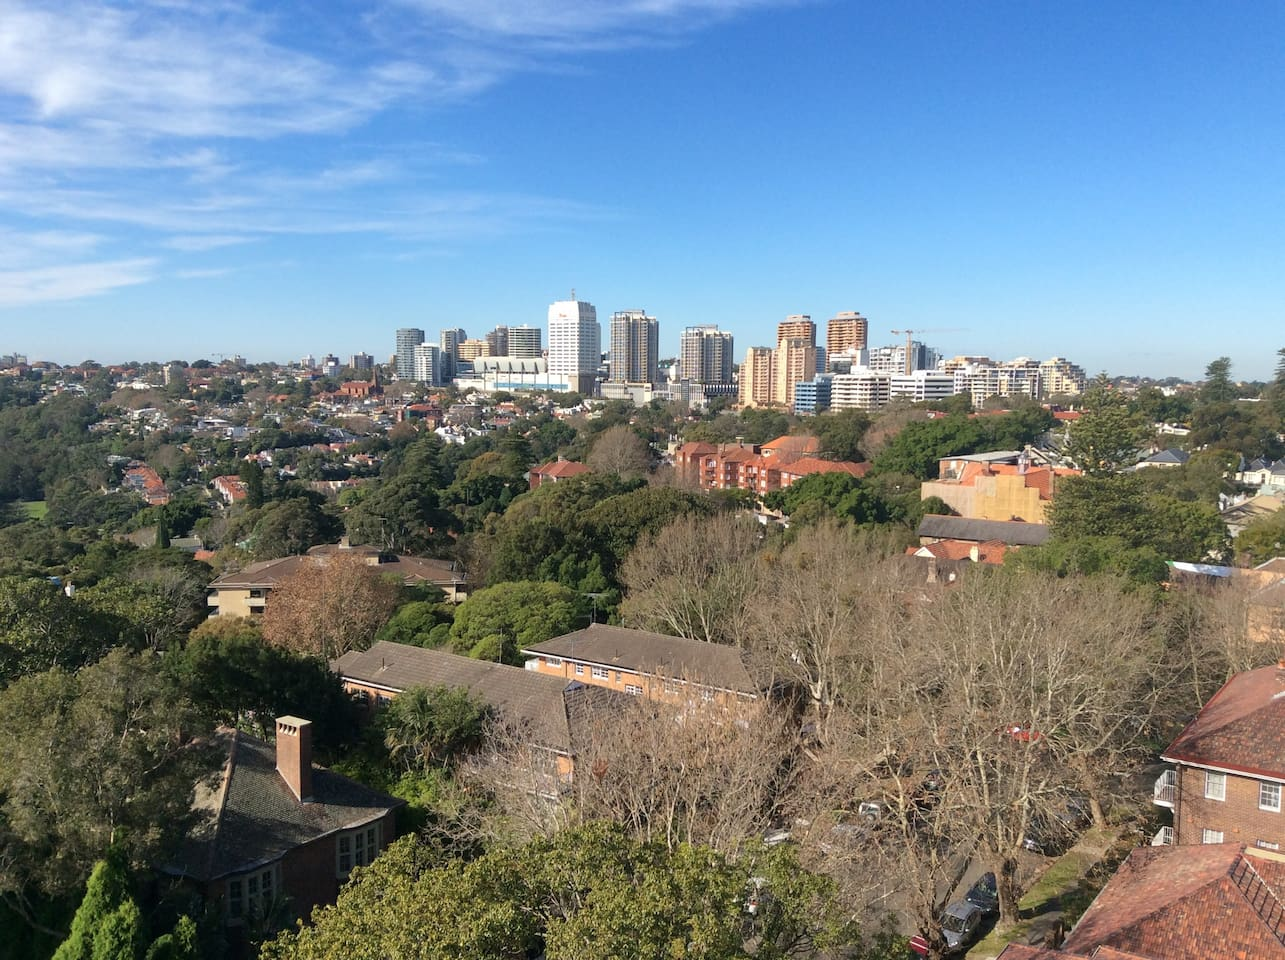 View from balcony, 15 min walk to Bondi Junction.